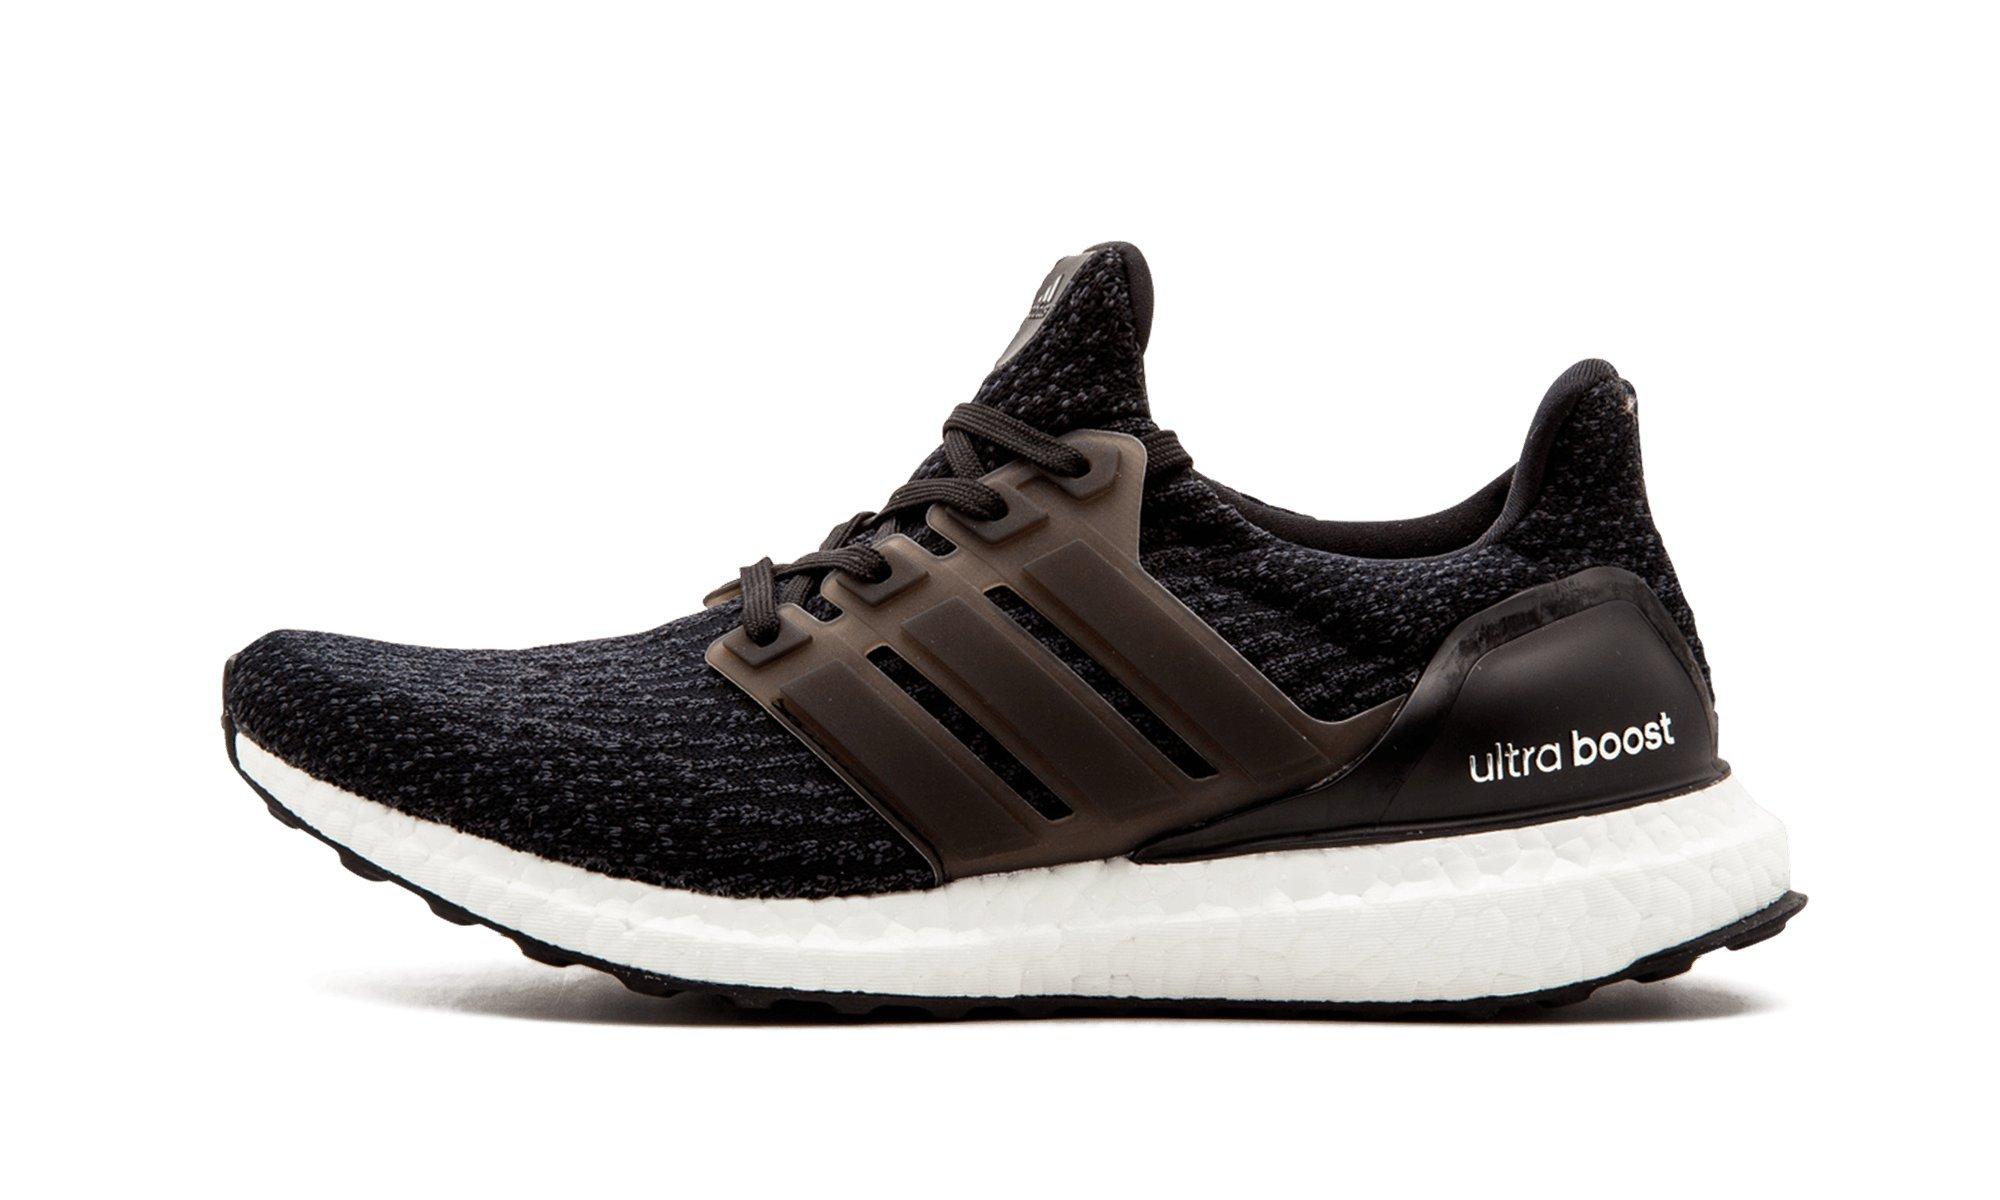 dbe6f62952c0b Galleon - Adidas Women s Ultraboost W Running Shoe